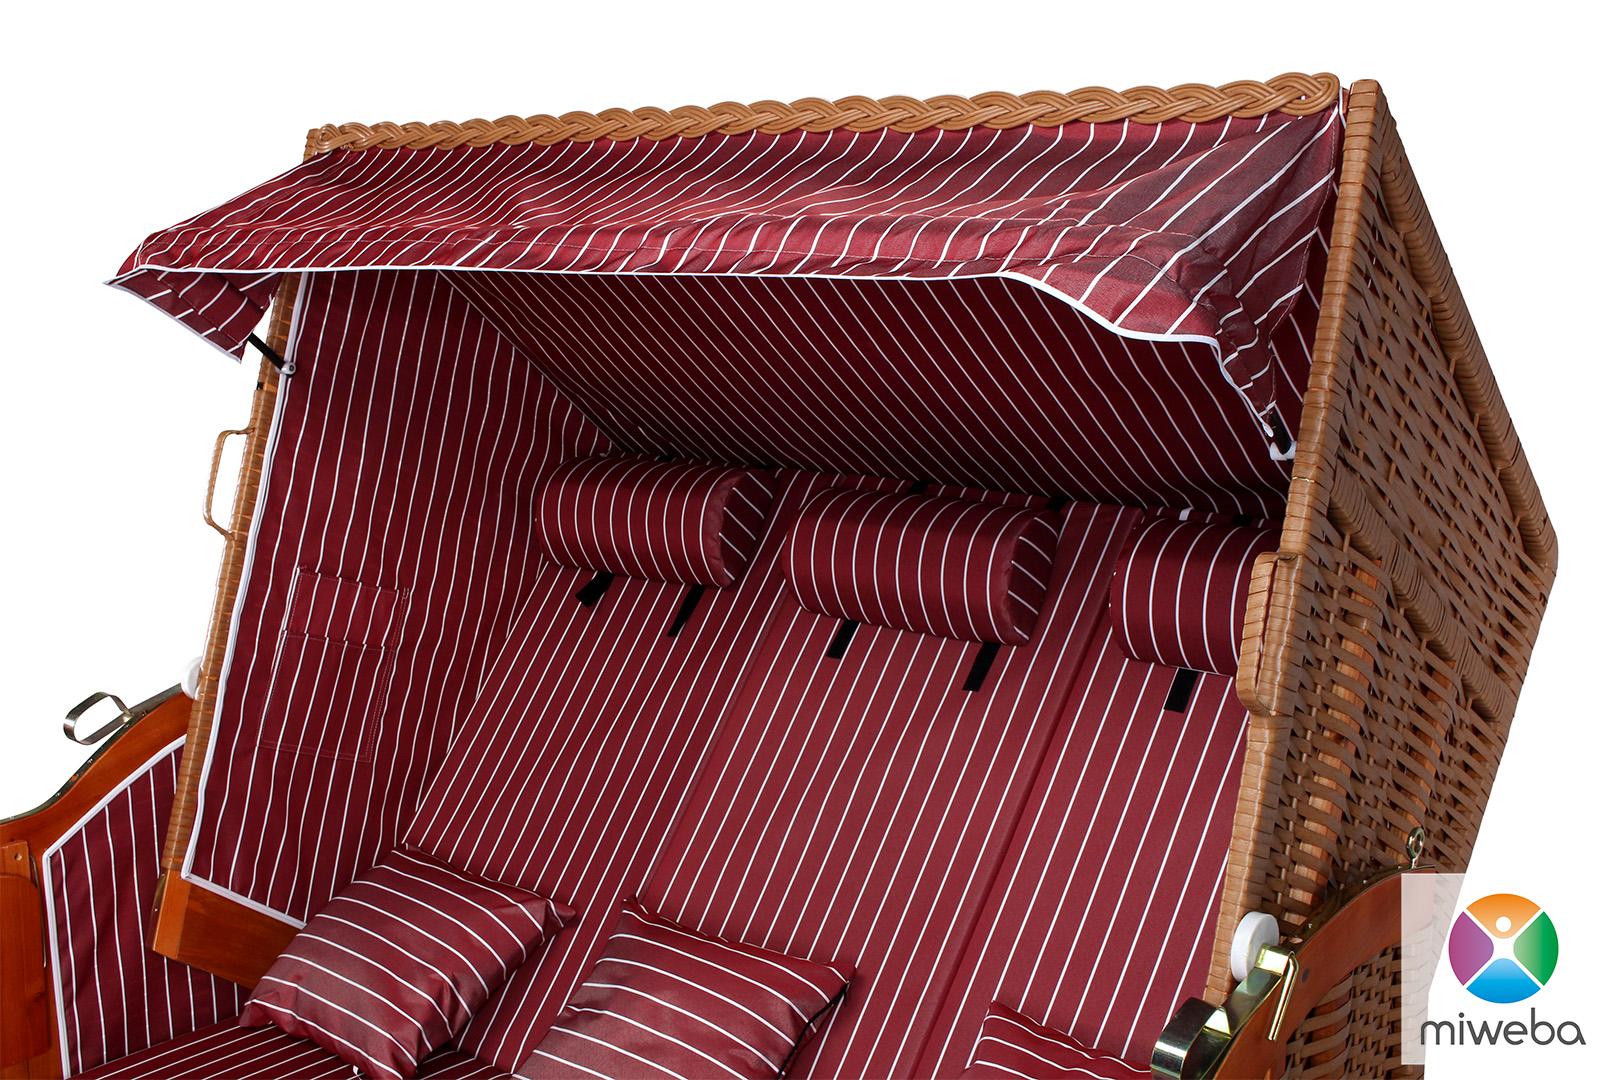 strandkorb usedom xxxl volllieger ostsee rattan garten. Black Bedroom Furniture Sets. Home Design Ideas